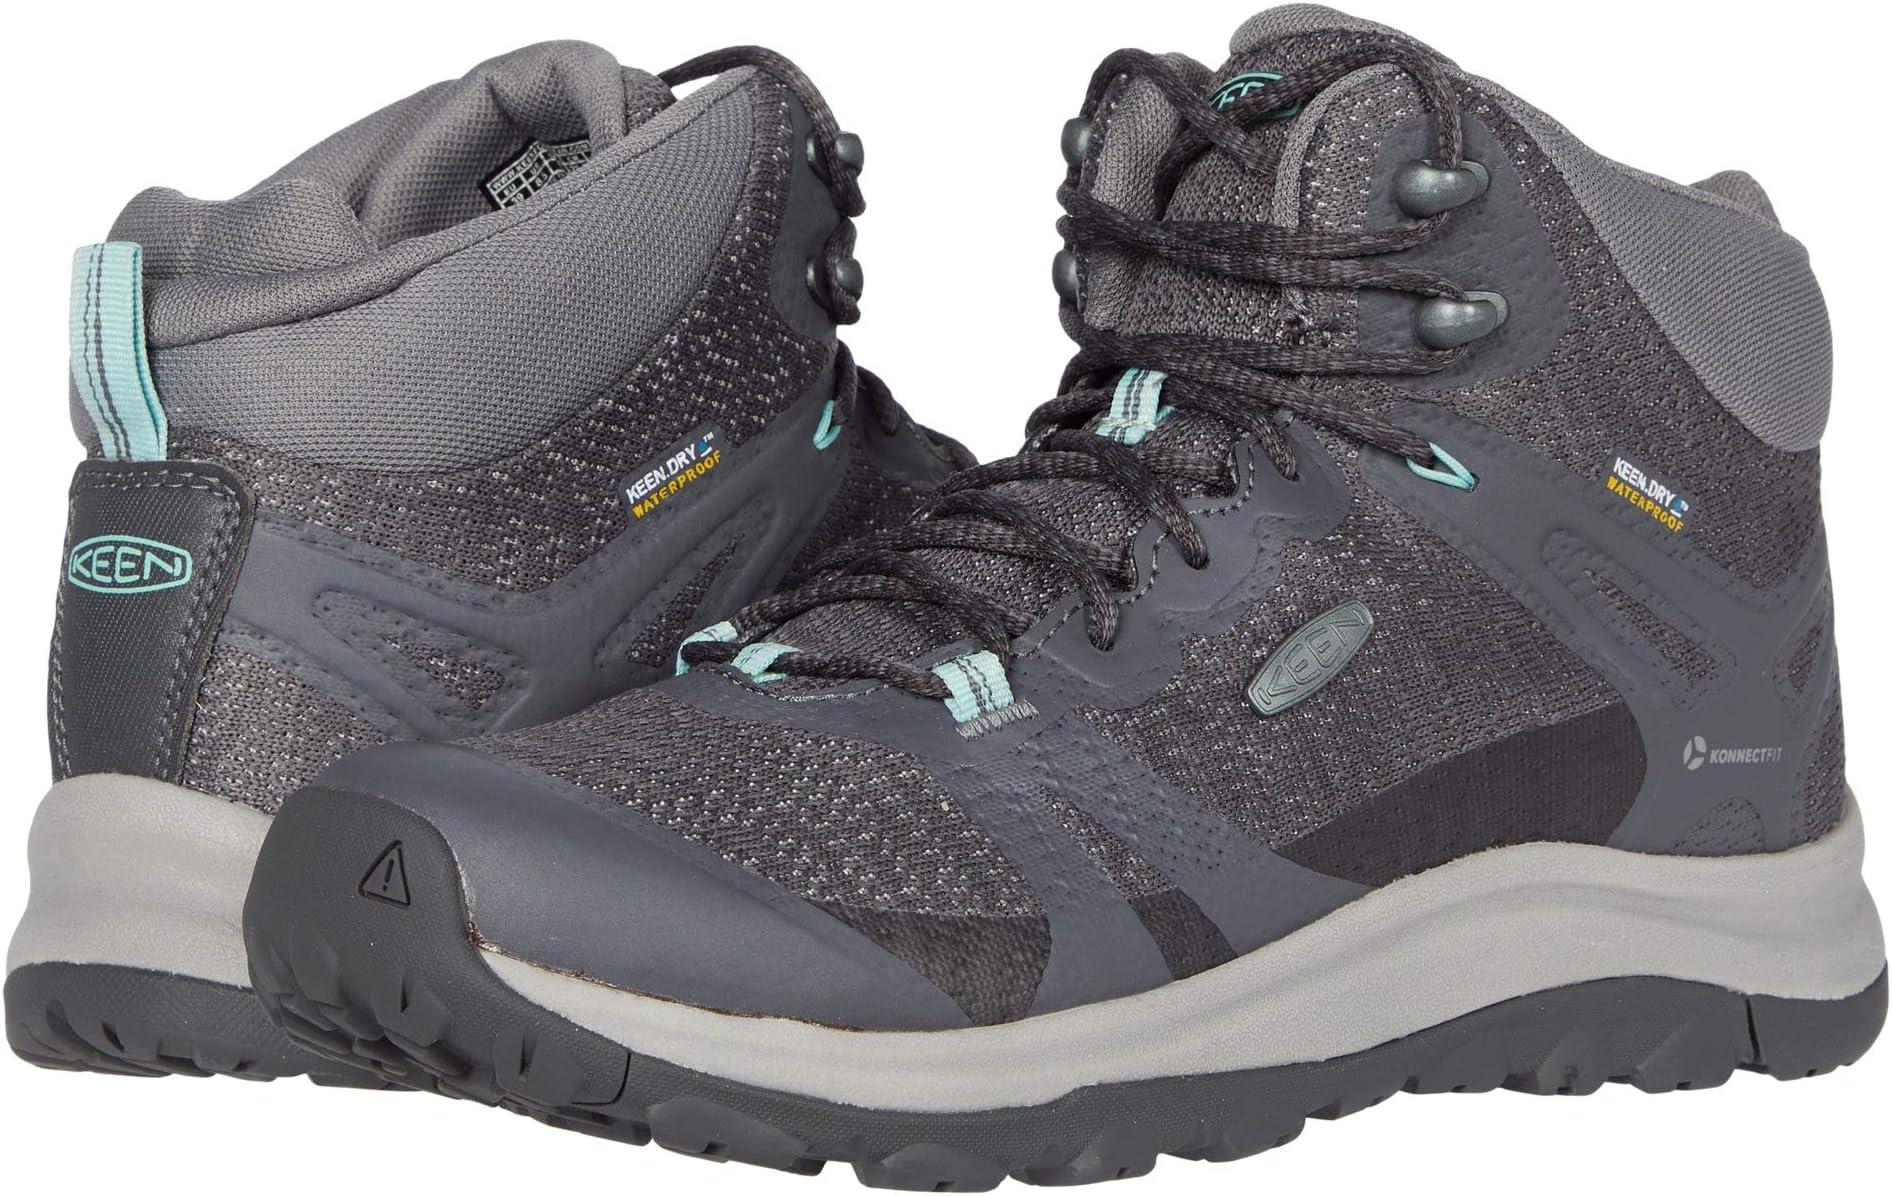 TC-4-Hiking-2020-05-12